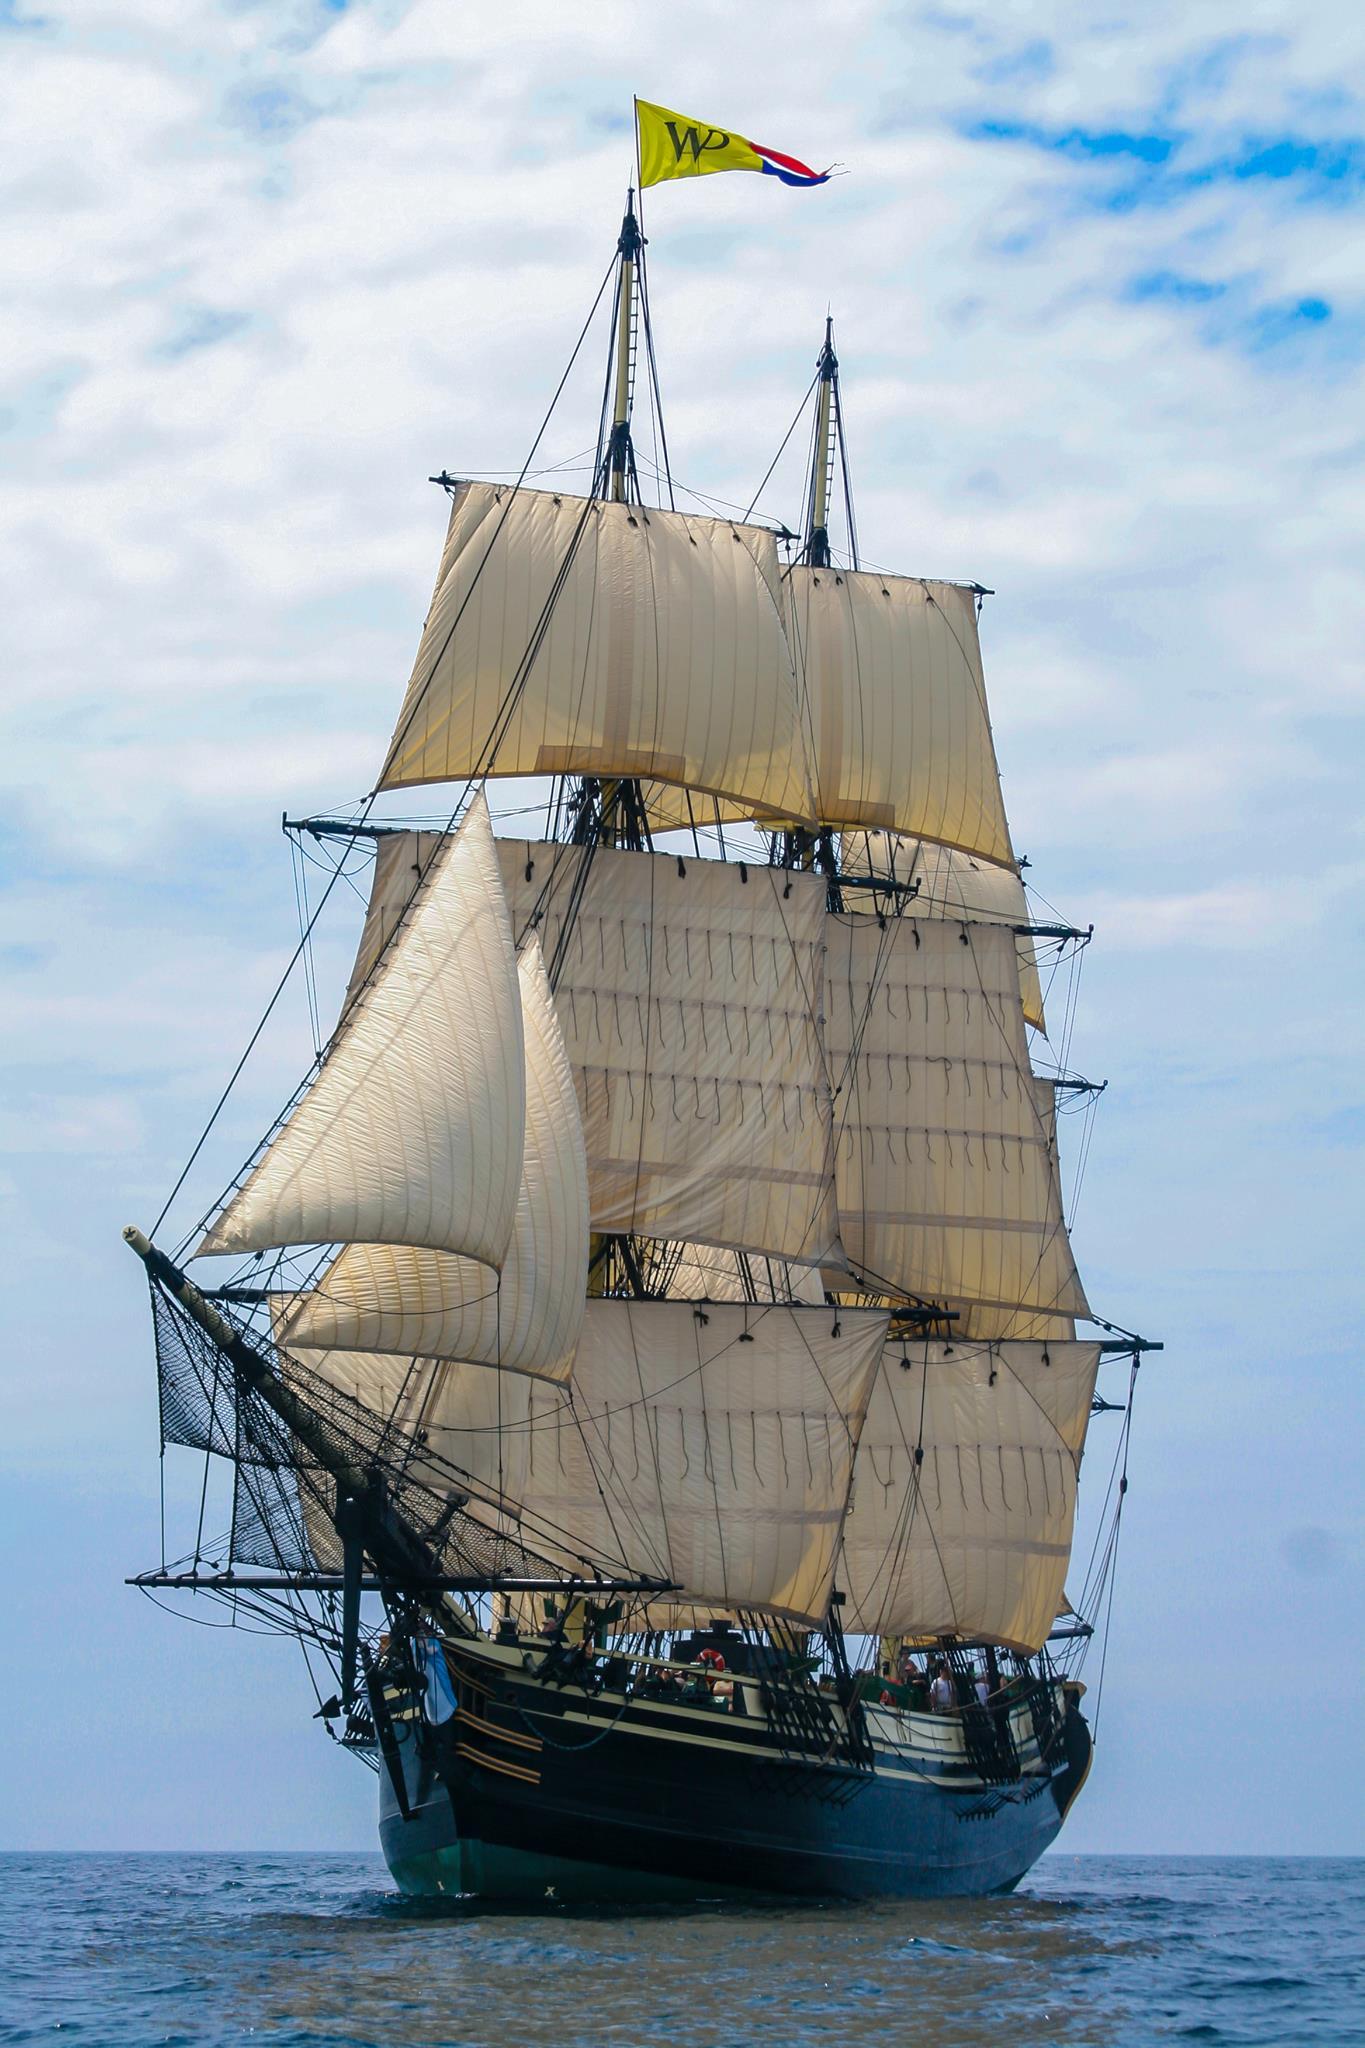 The Friendship of Salem under sail.